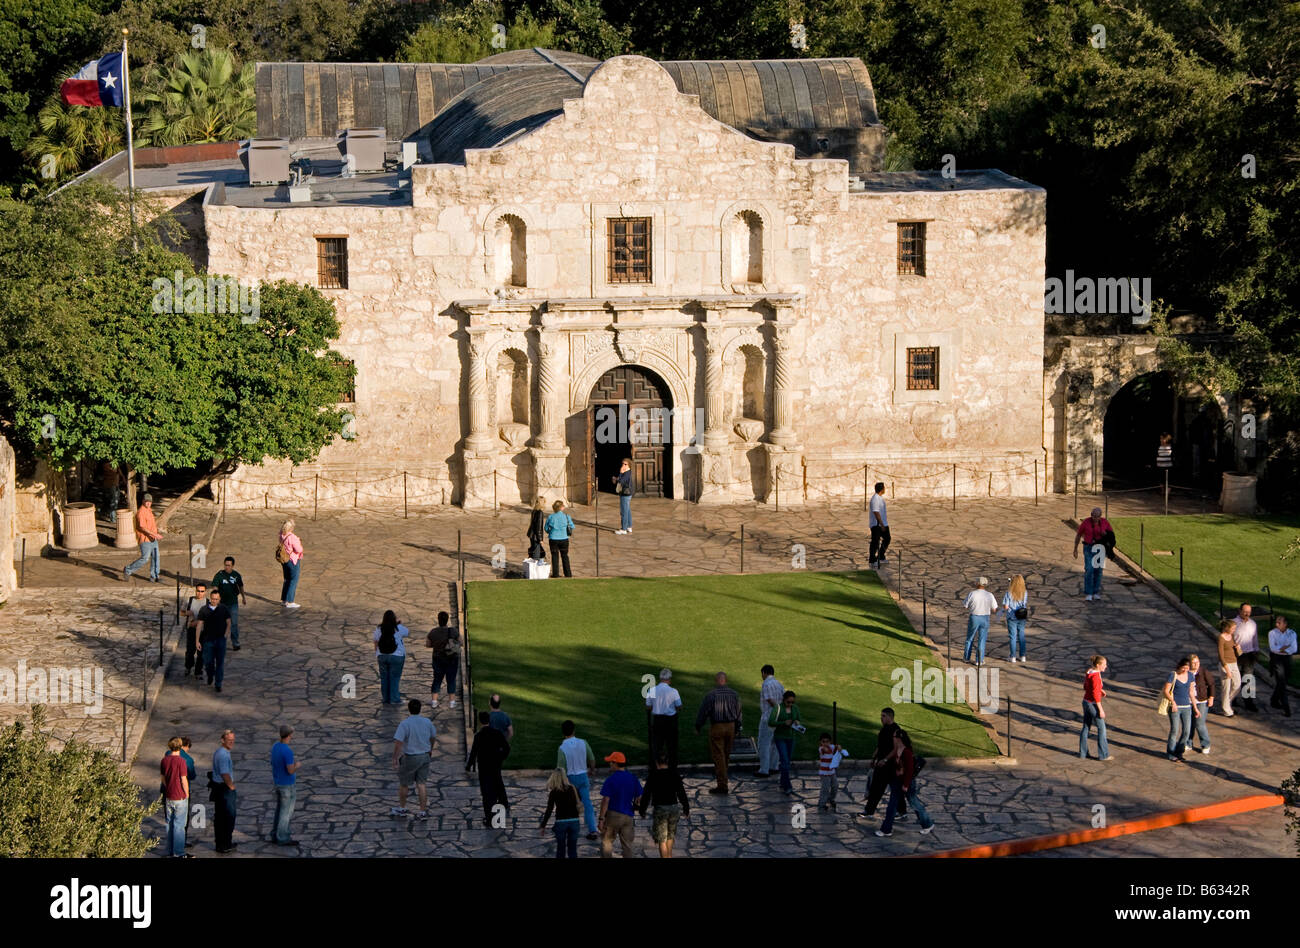 San Antonio Missions, tourists at The Alamo (AKA Mission San Antonio de Valero), State Historic Site - Stock Image